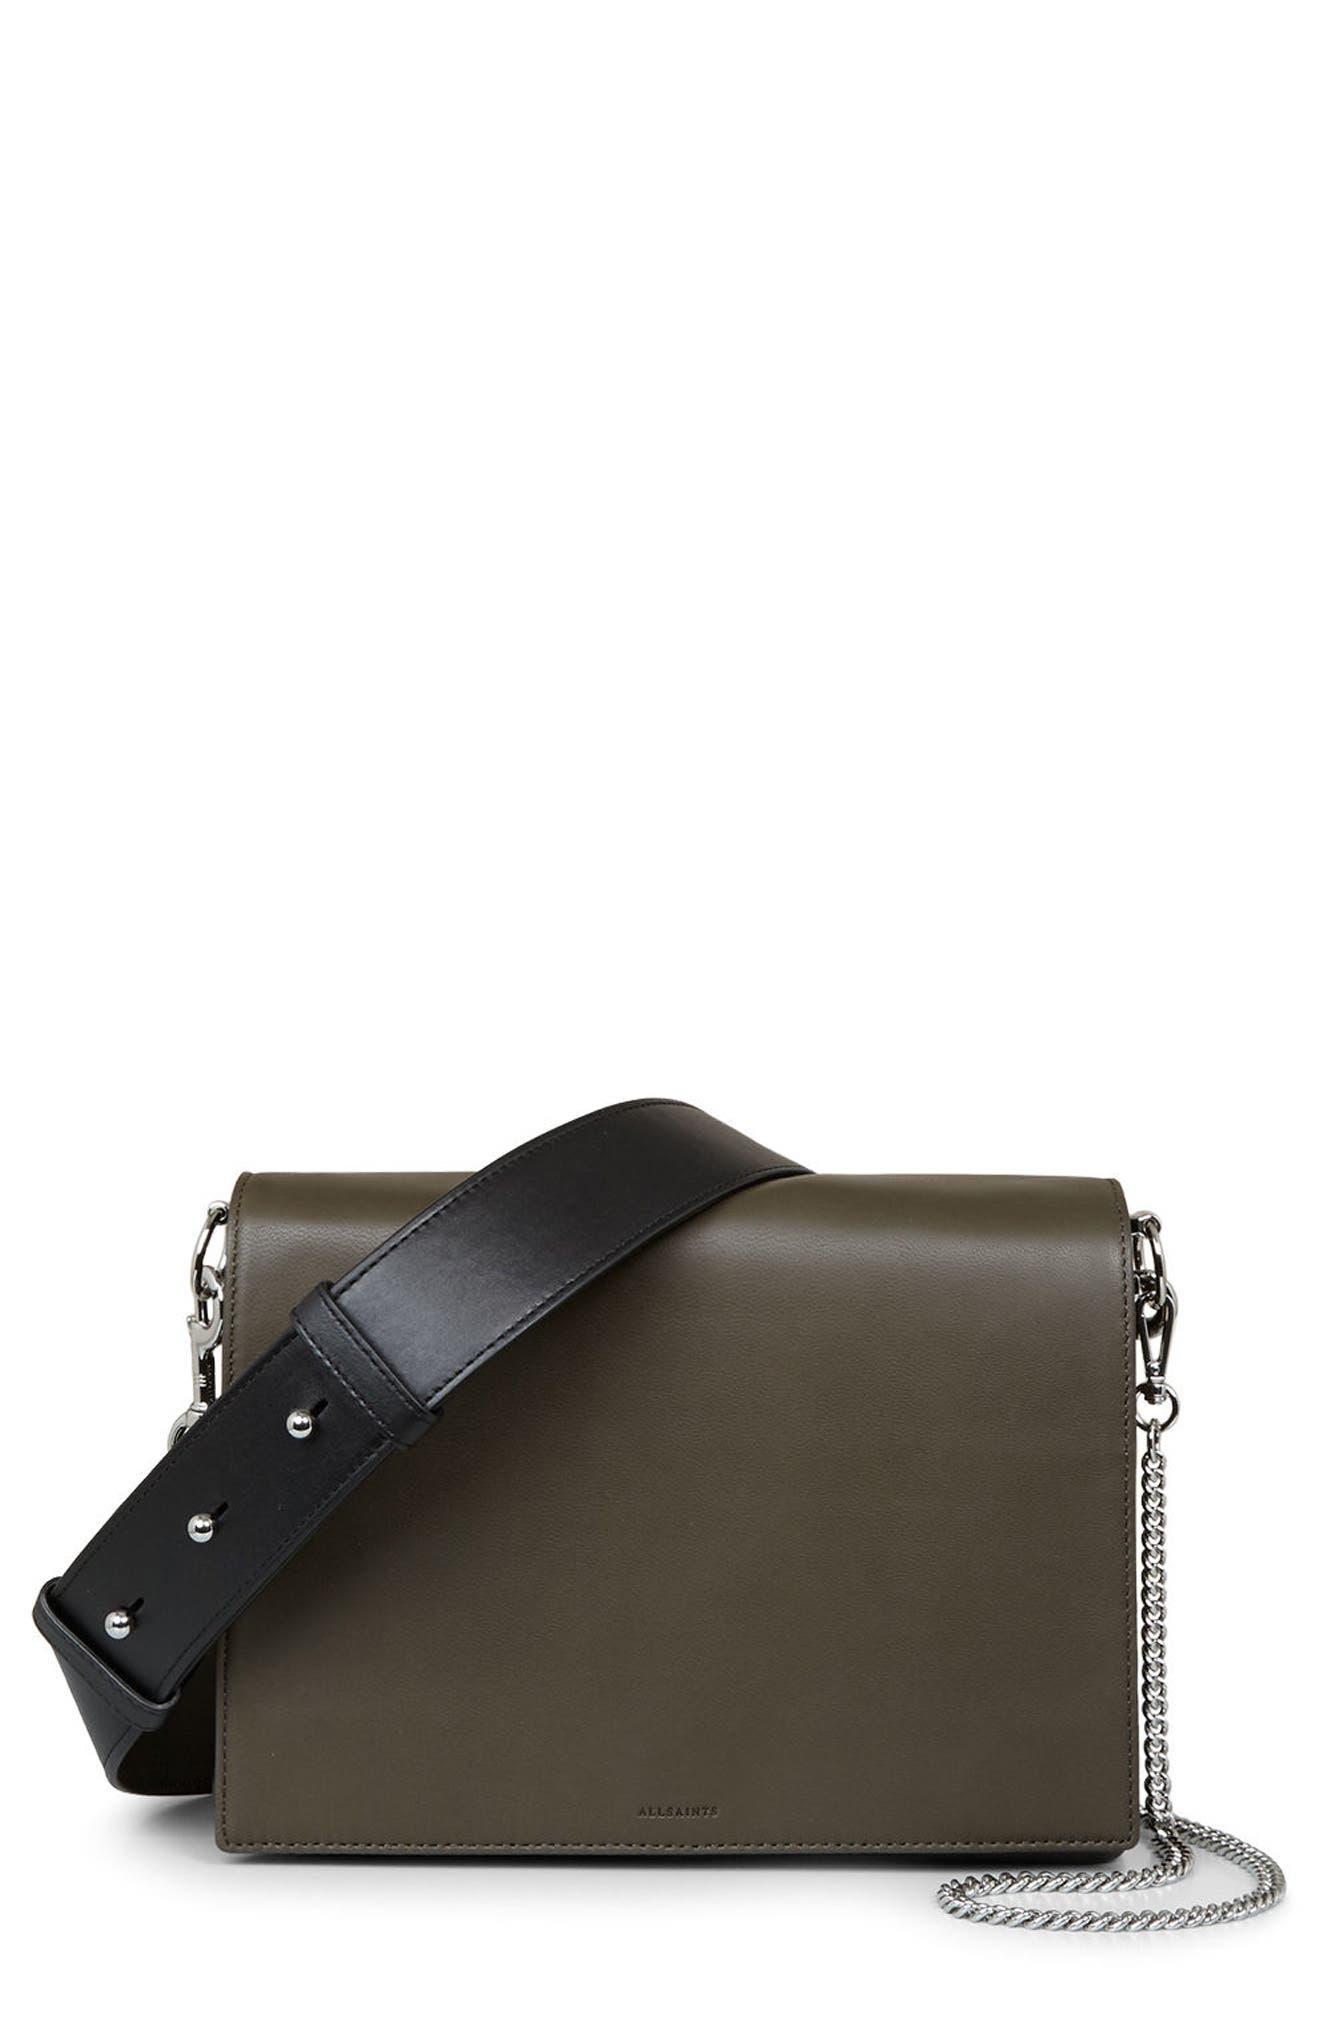 Main Image - ALLSAINTS Zep Lambskin Leather Box Bag